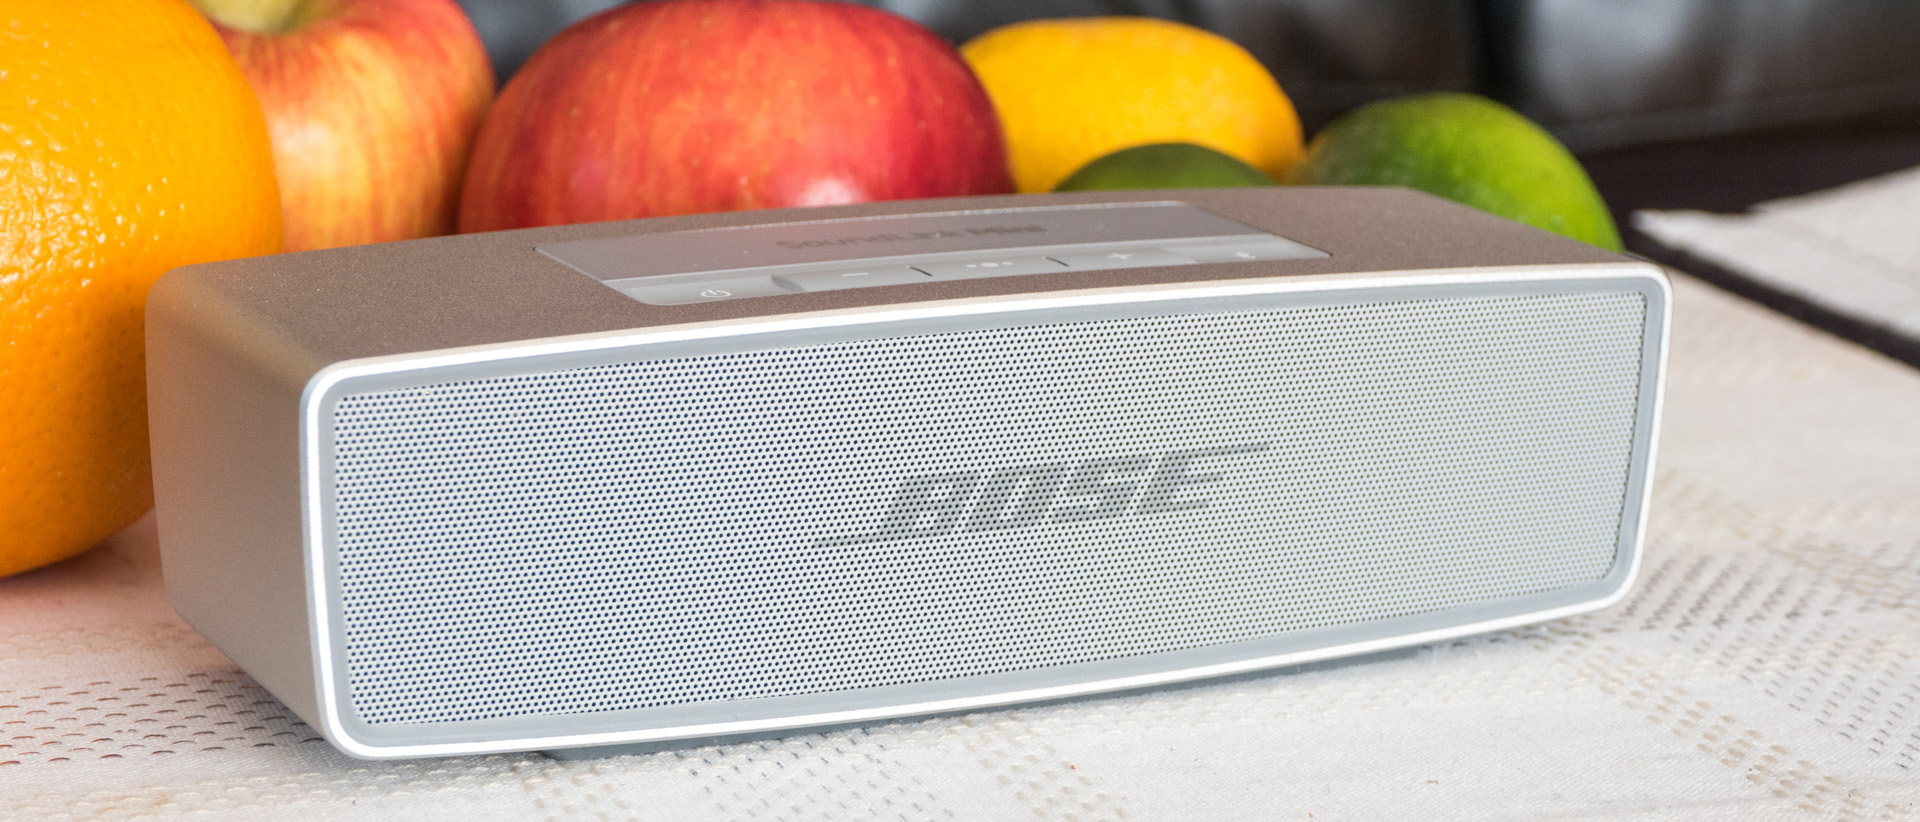 Bose Soundlink Mini Ii Techradar With Travel Bag